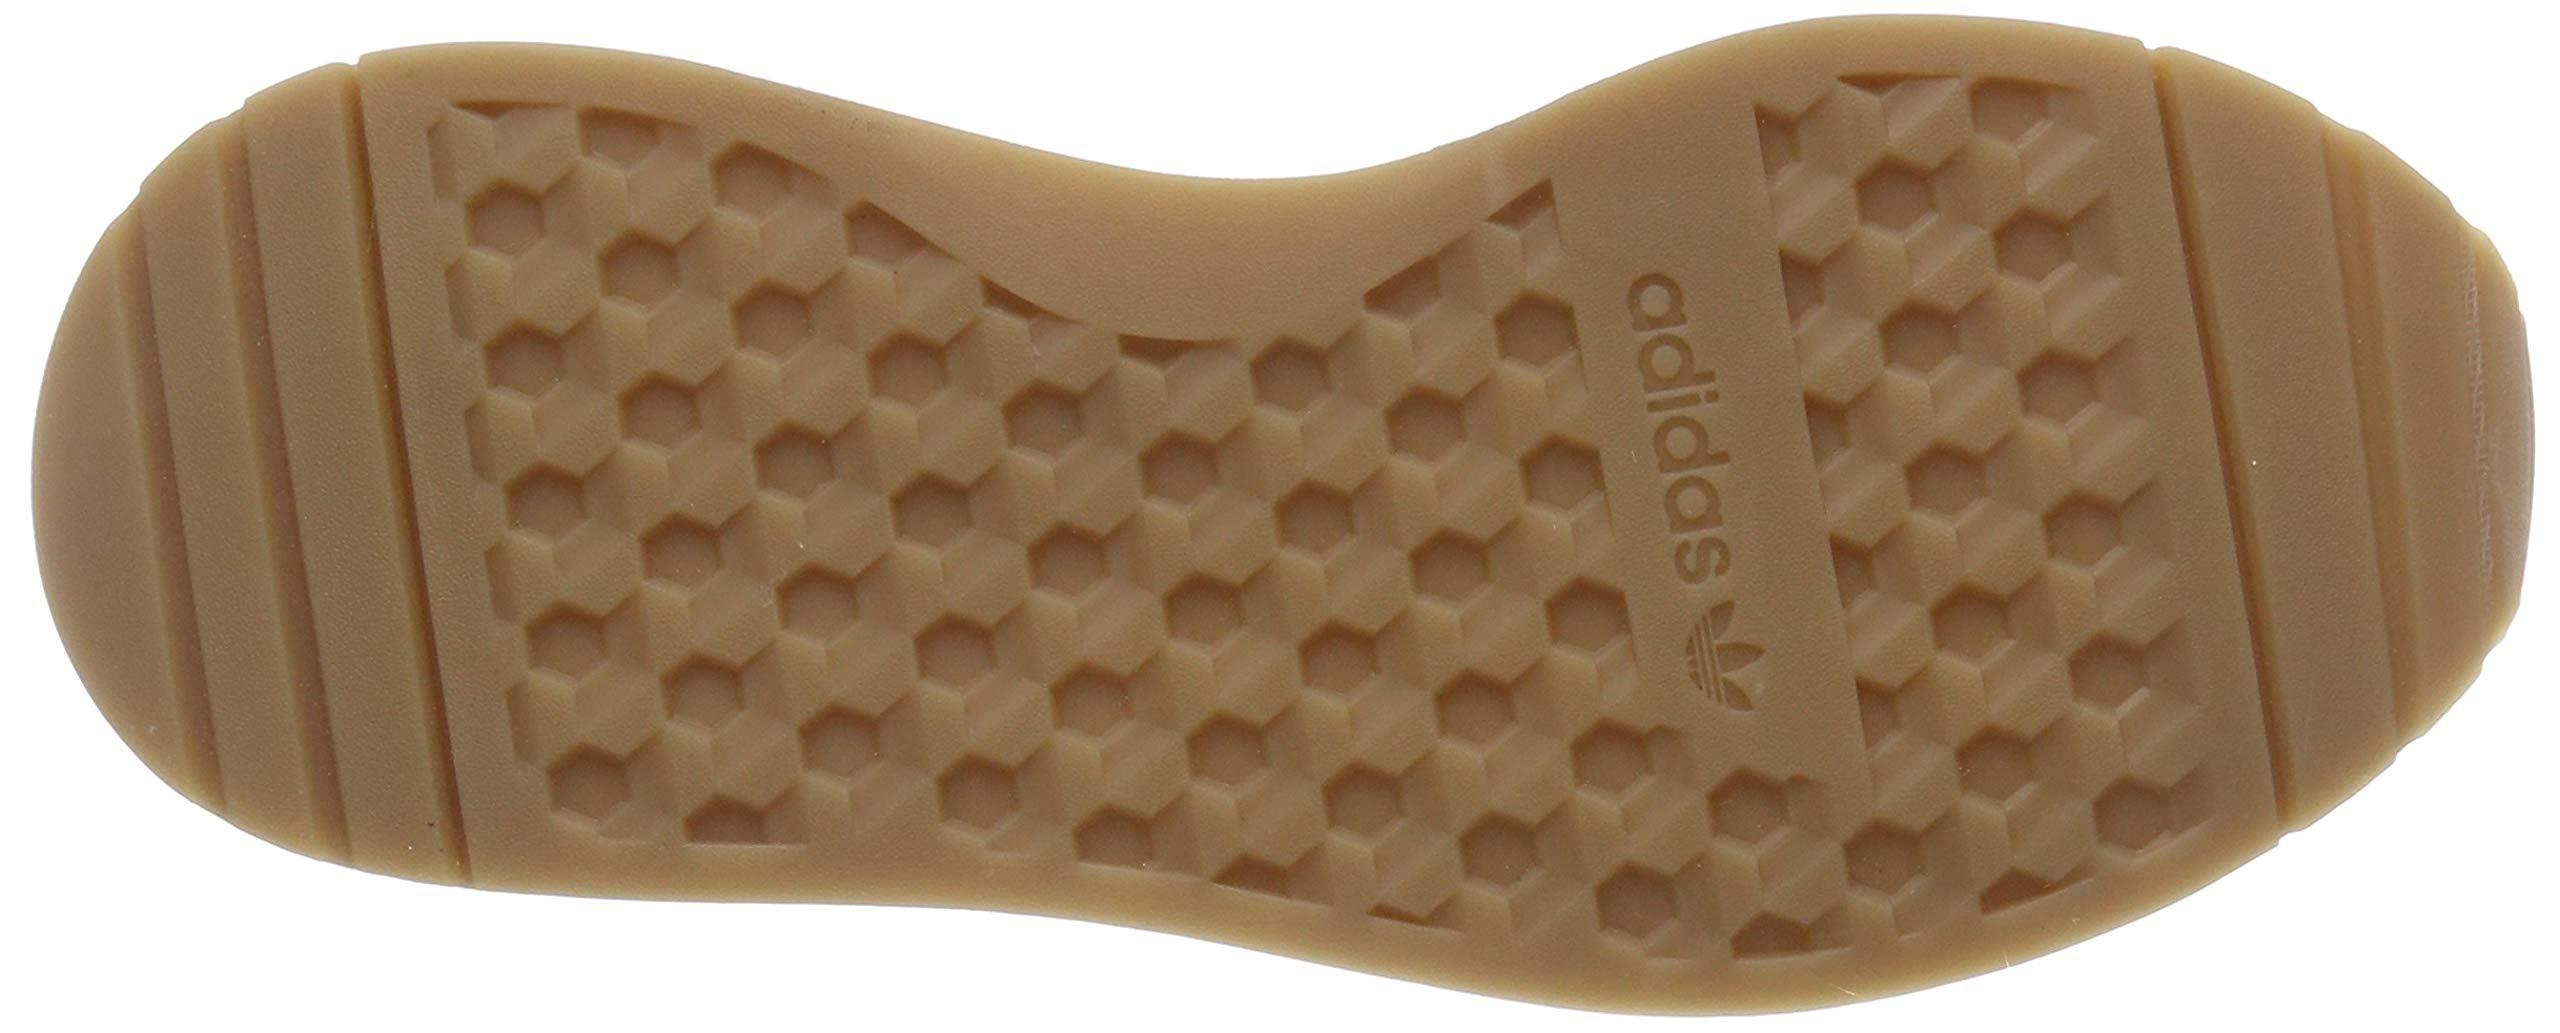 adidas N-5923, Scarpe da Ginnastica Uomo 3 spesavip